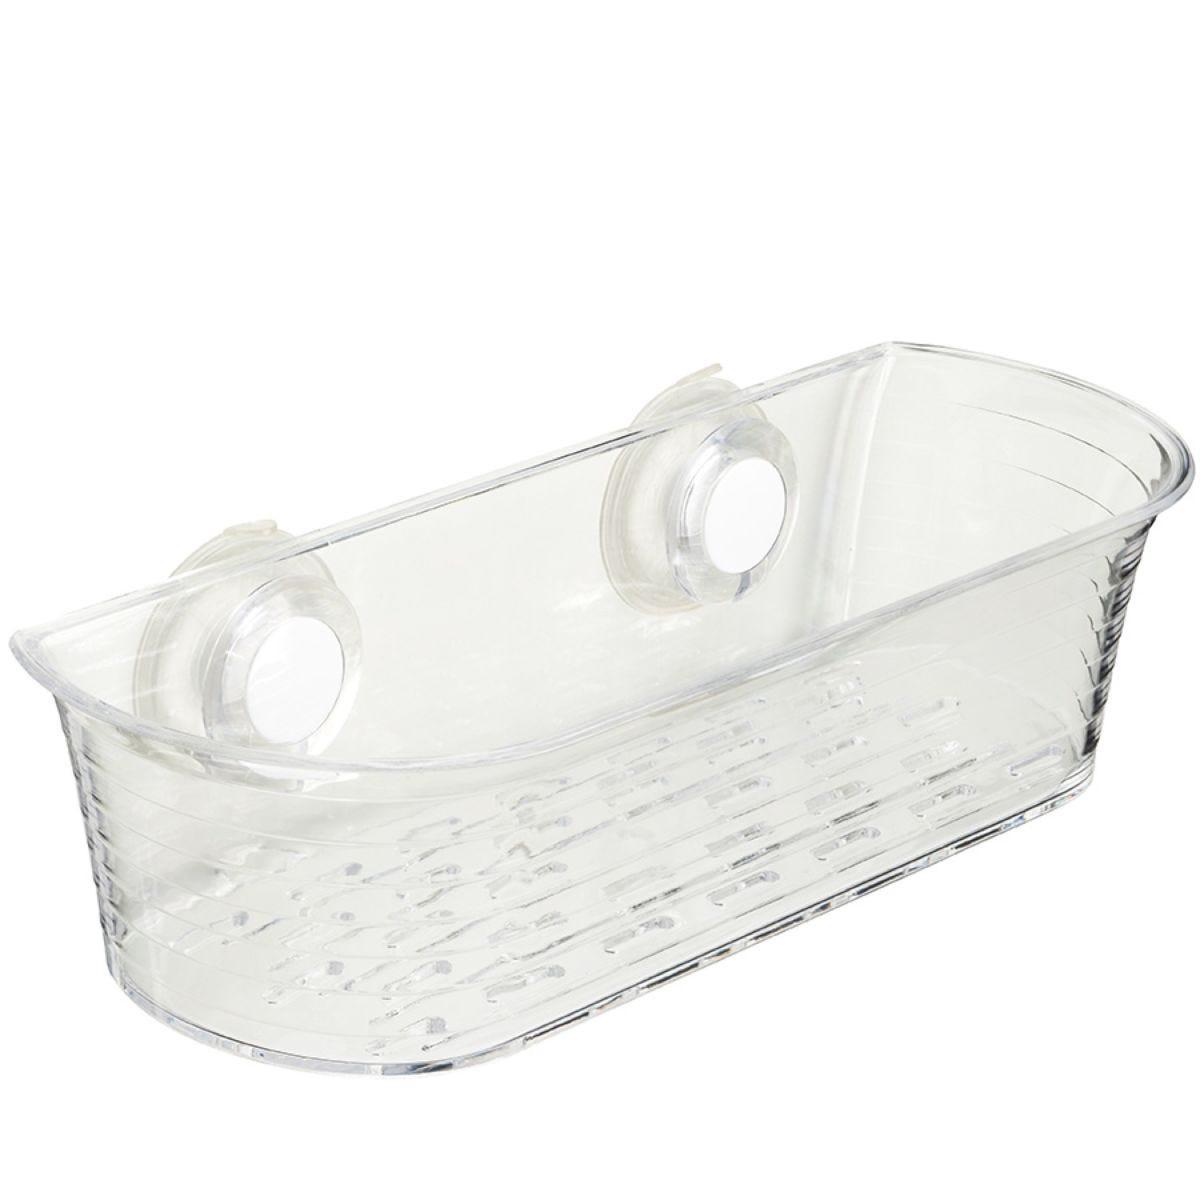 Croydex Push 'N' Lock Shower Basket